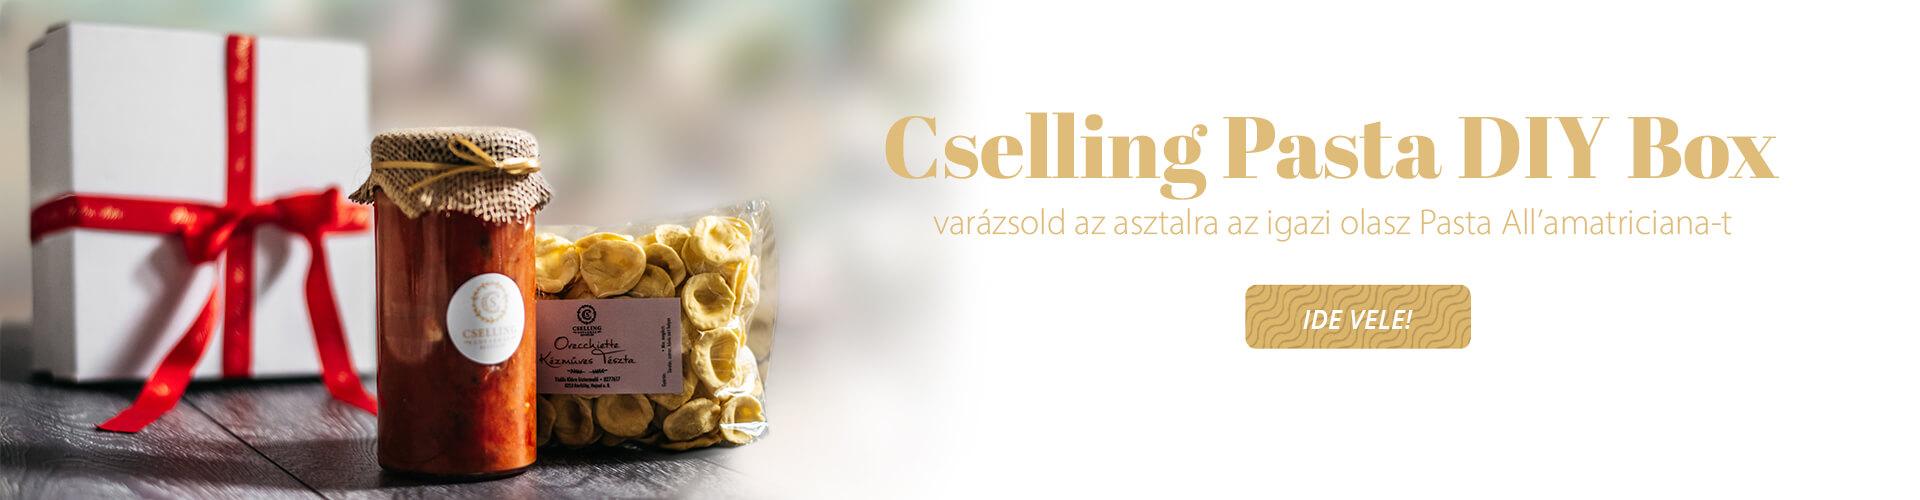 Cselling Pasta Box banner